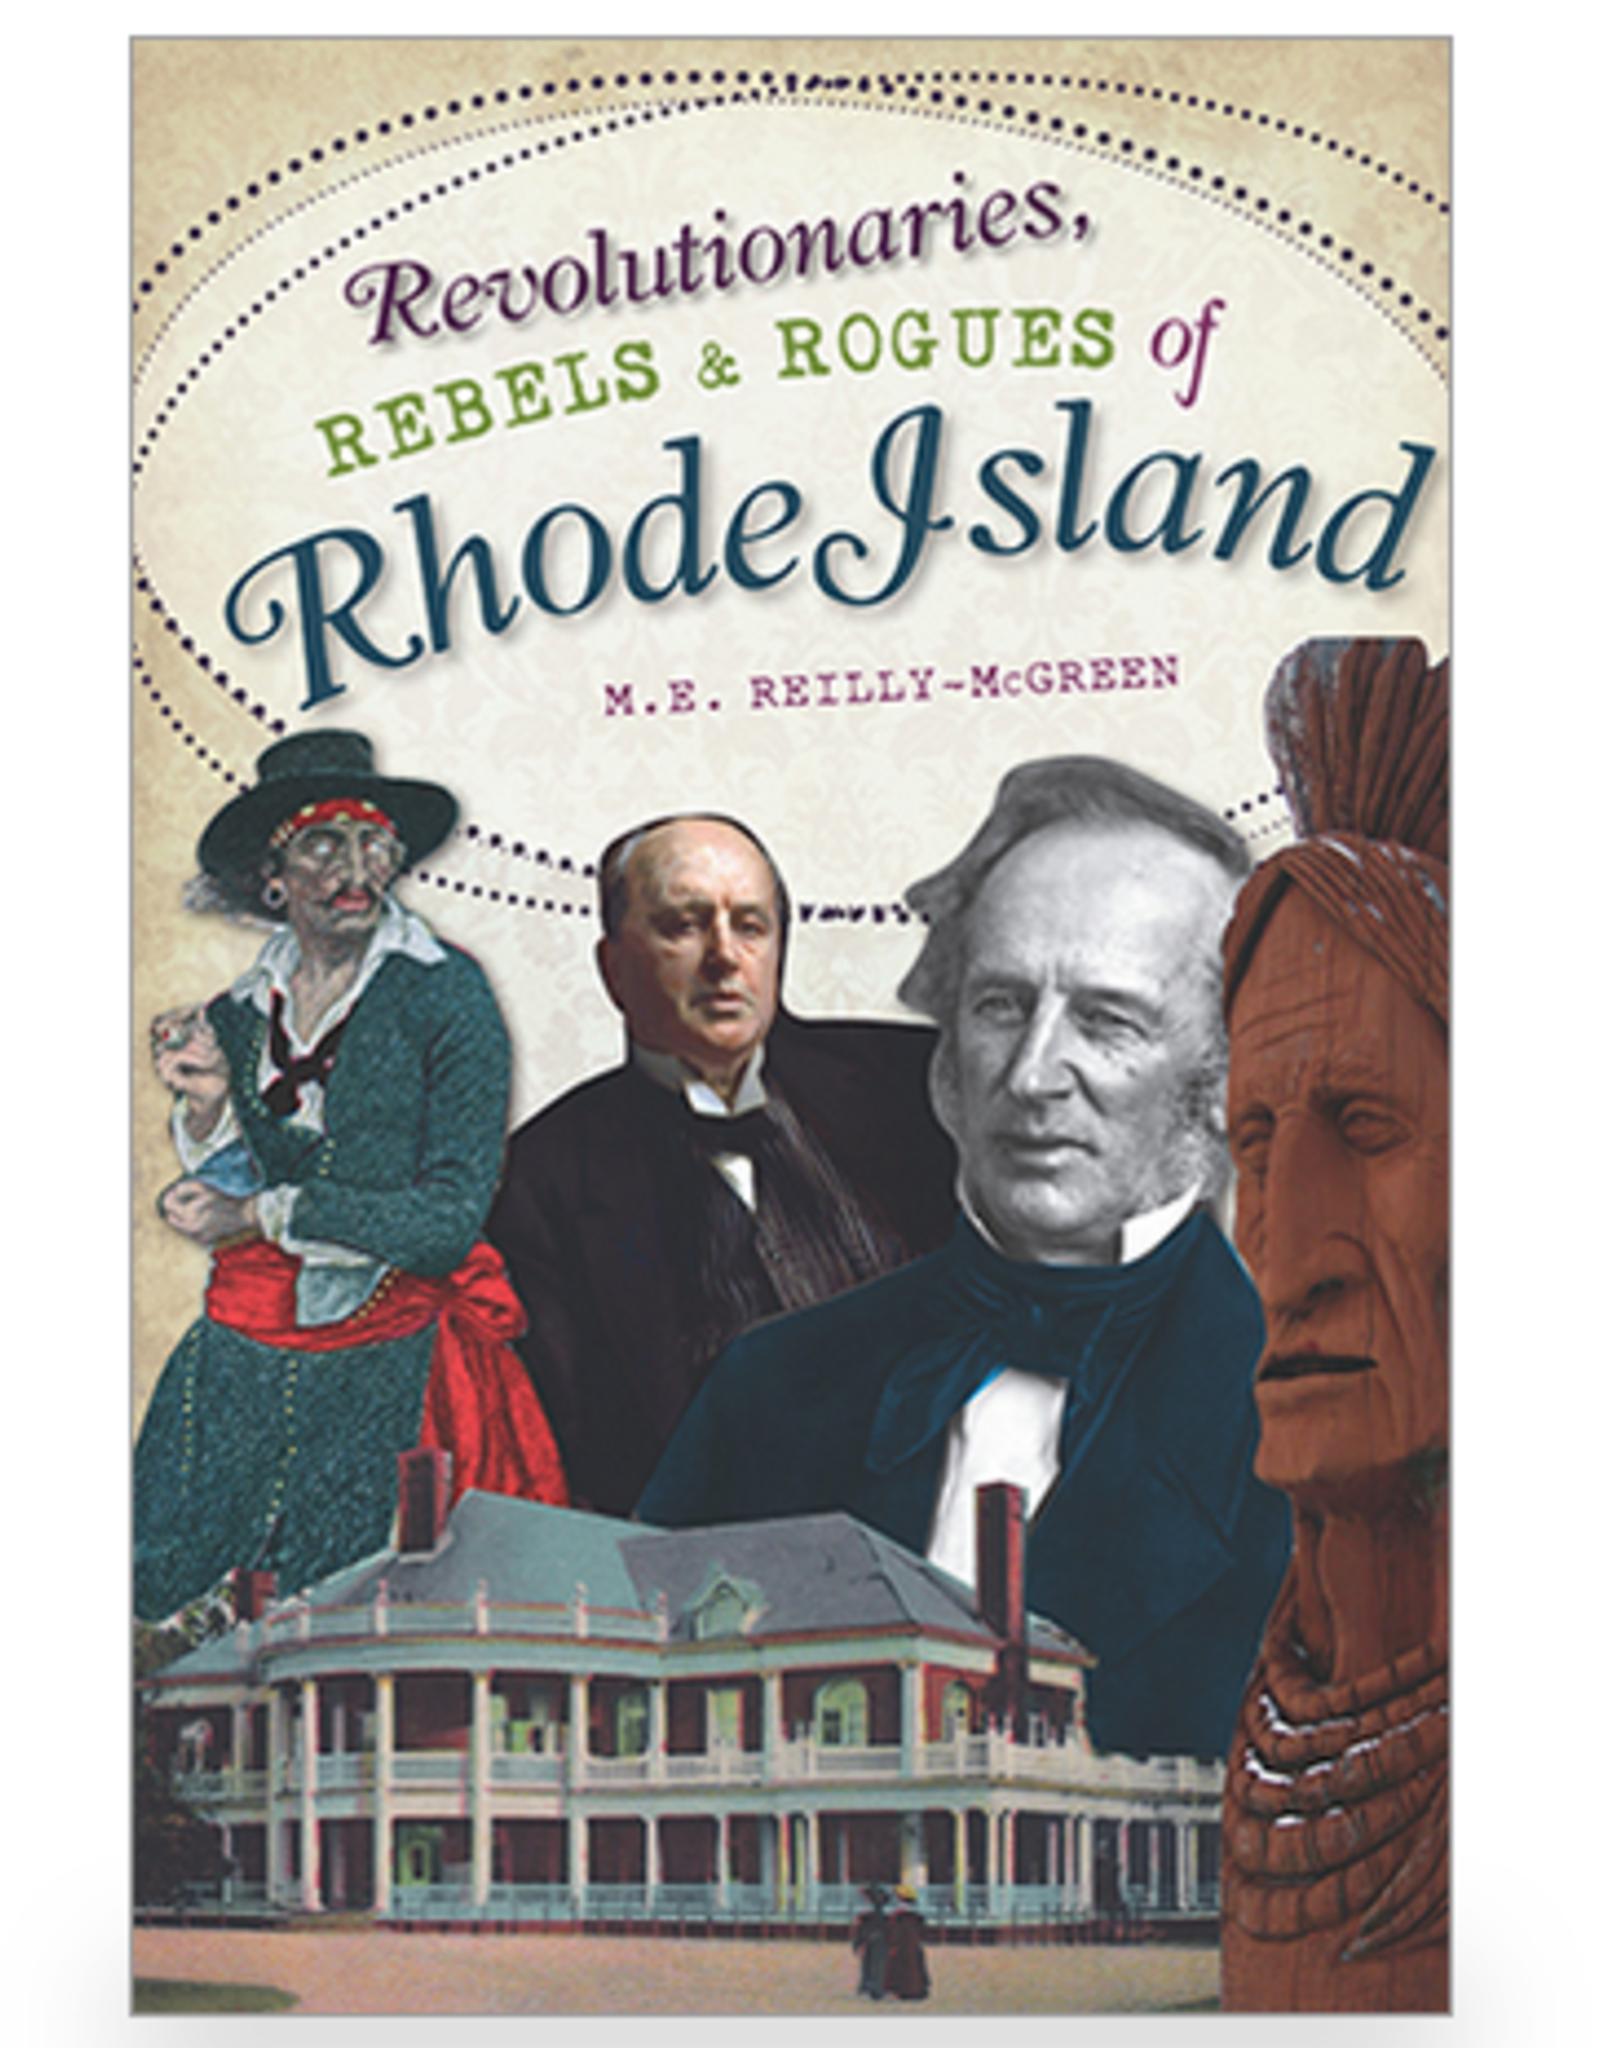 Revolutionaries, Rebels and Rogues of Rhode Island